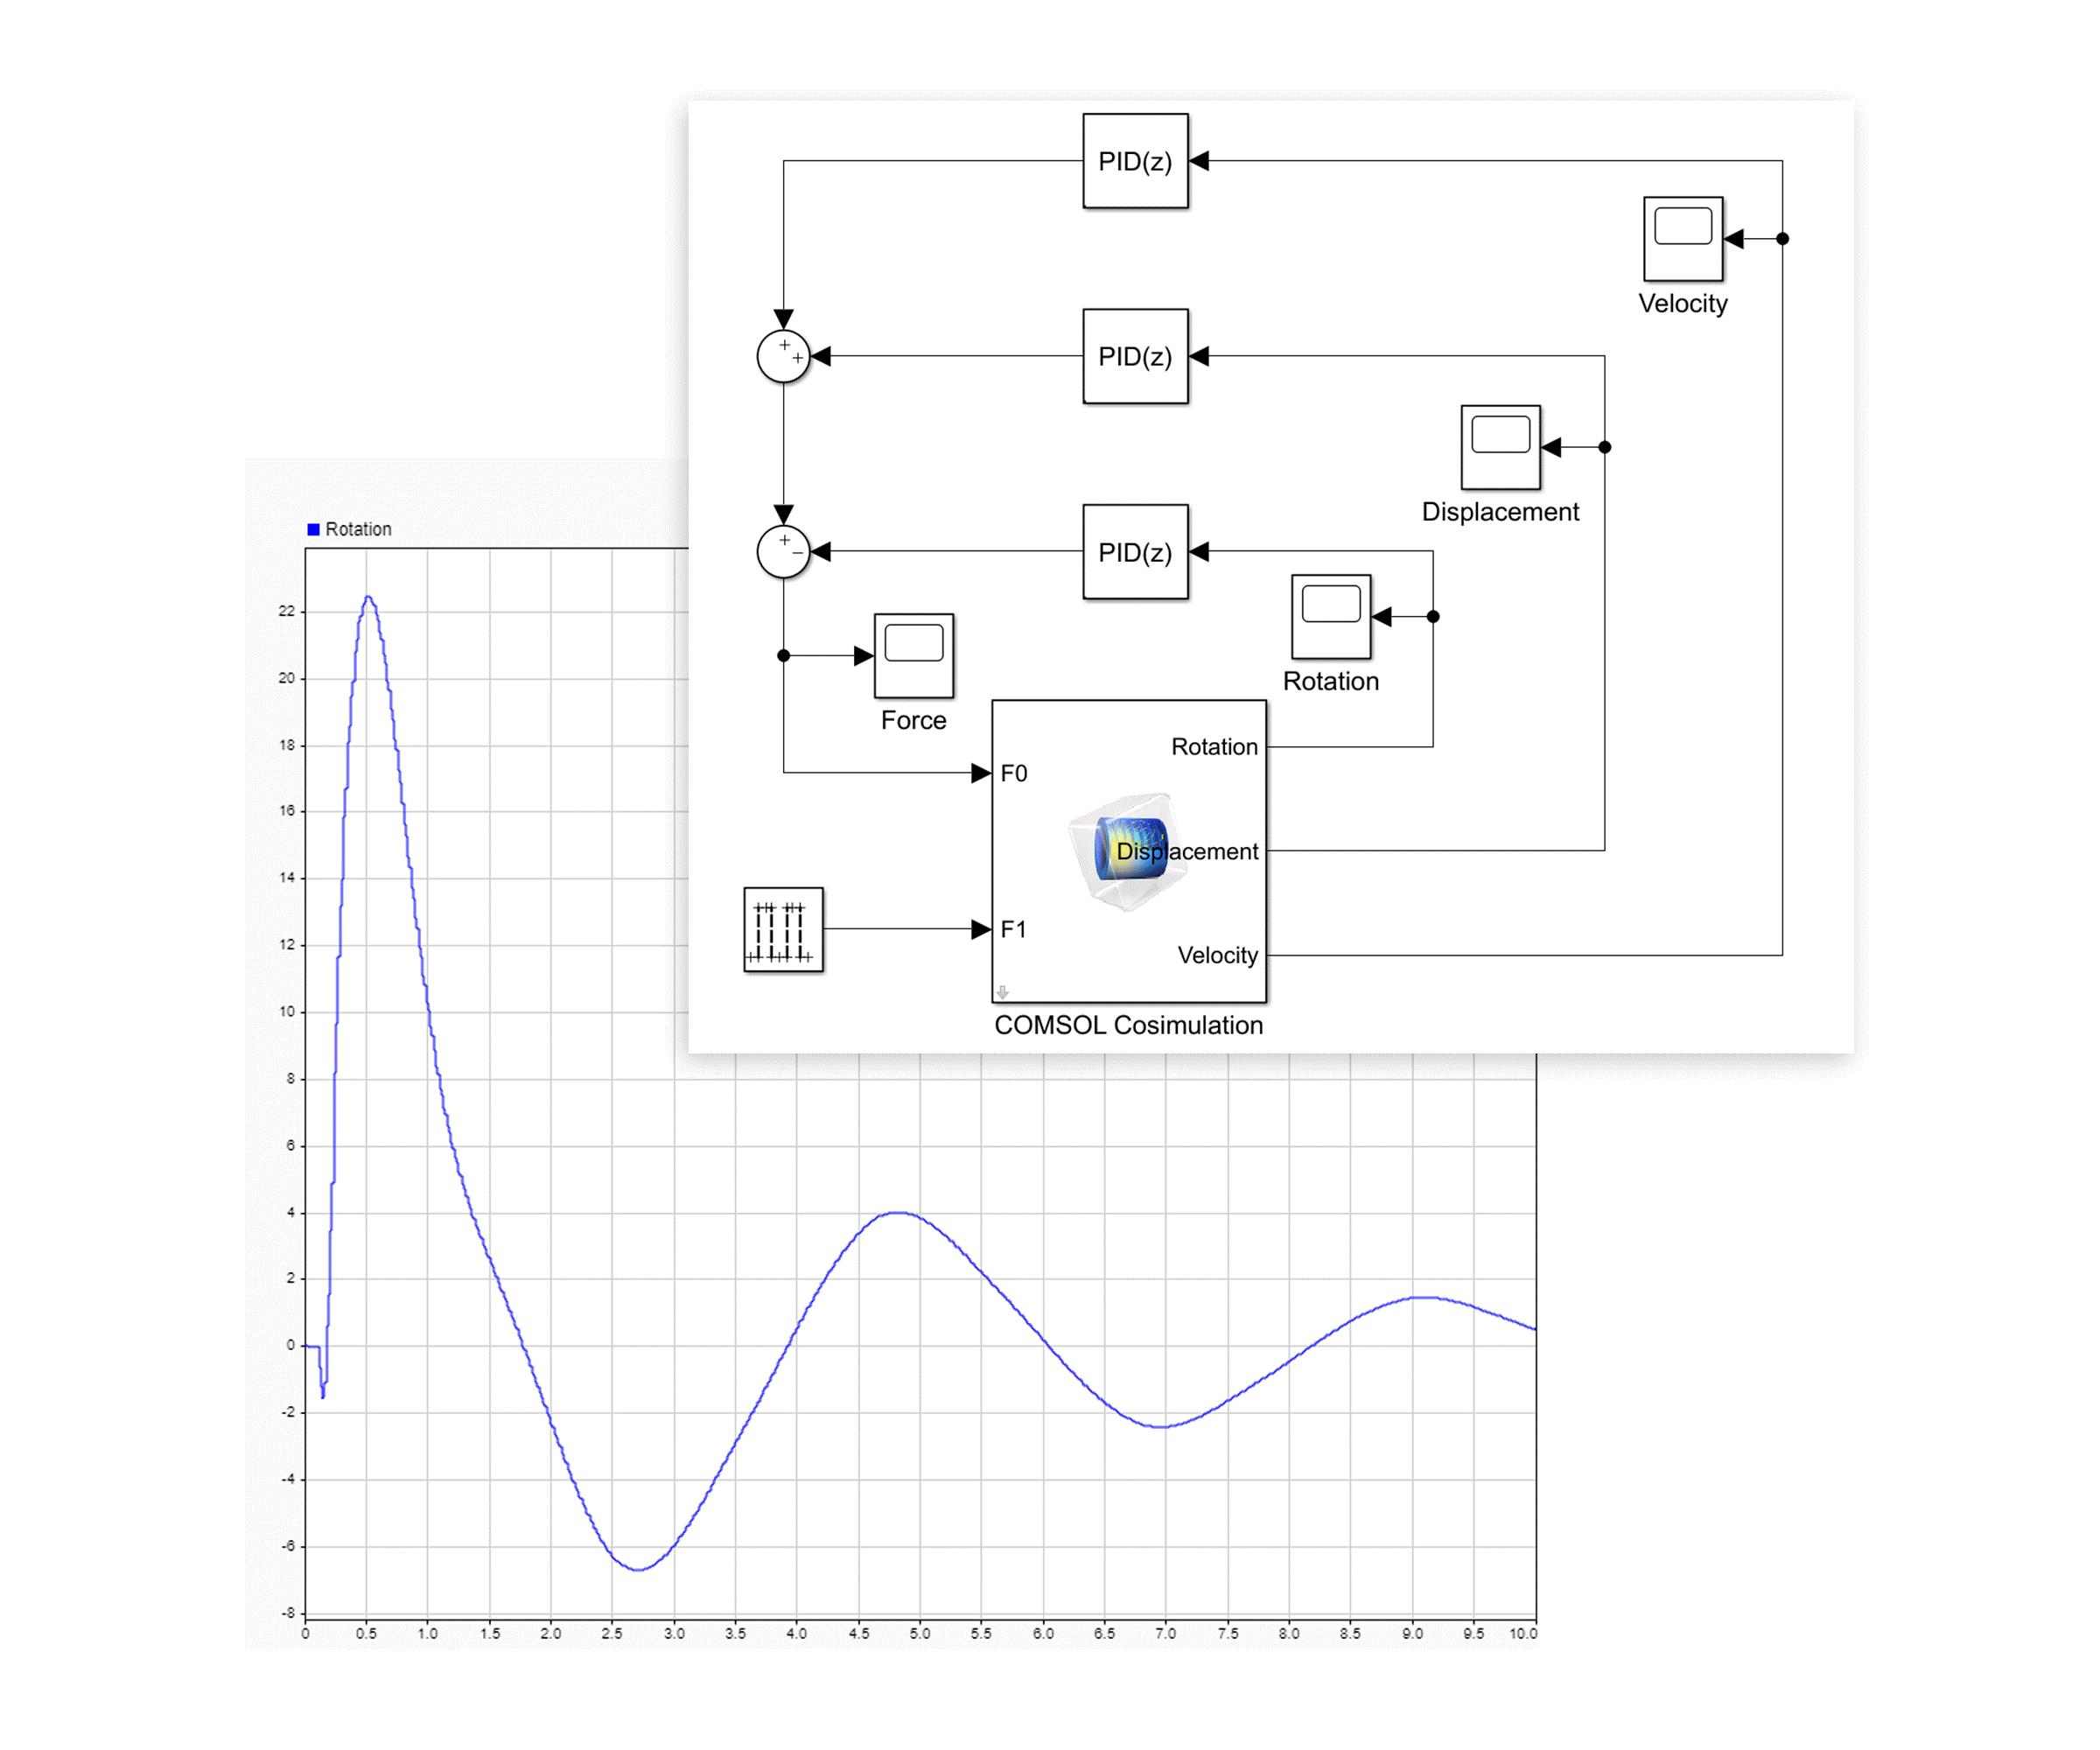 COMSOL Multiphysics®와 Simulink®를 사용해 통합 시뮬레이션한 다물체 동역학 예제